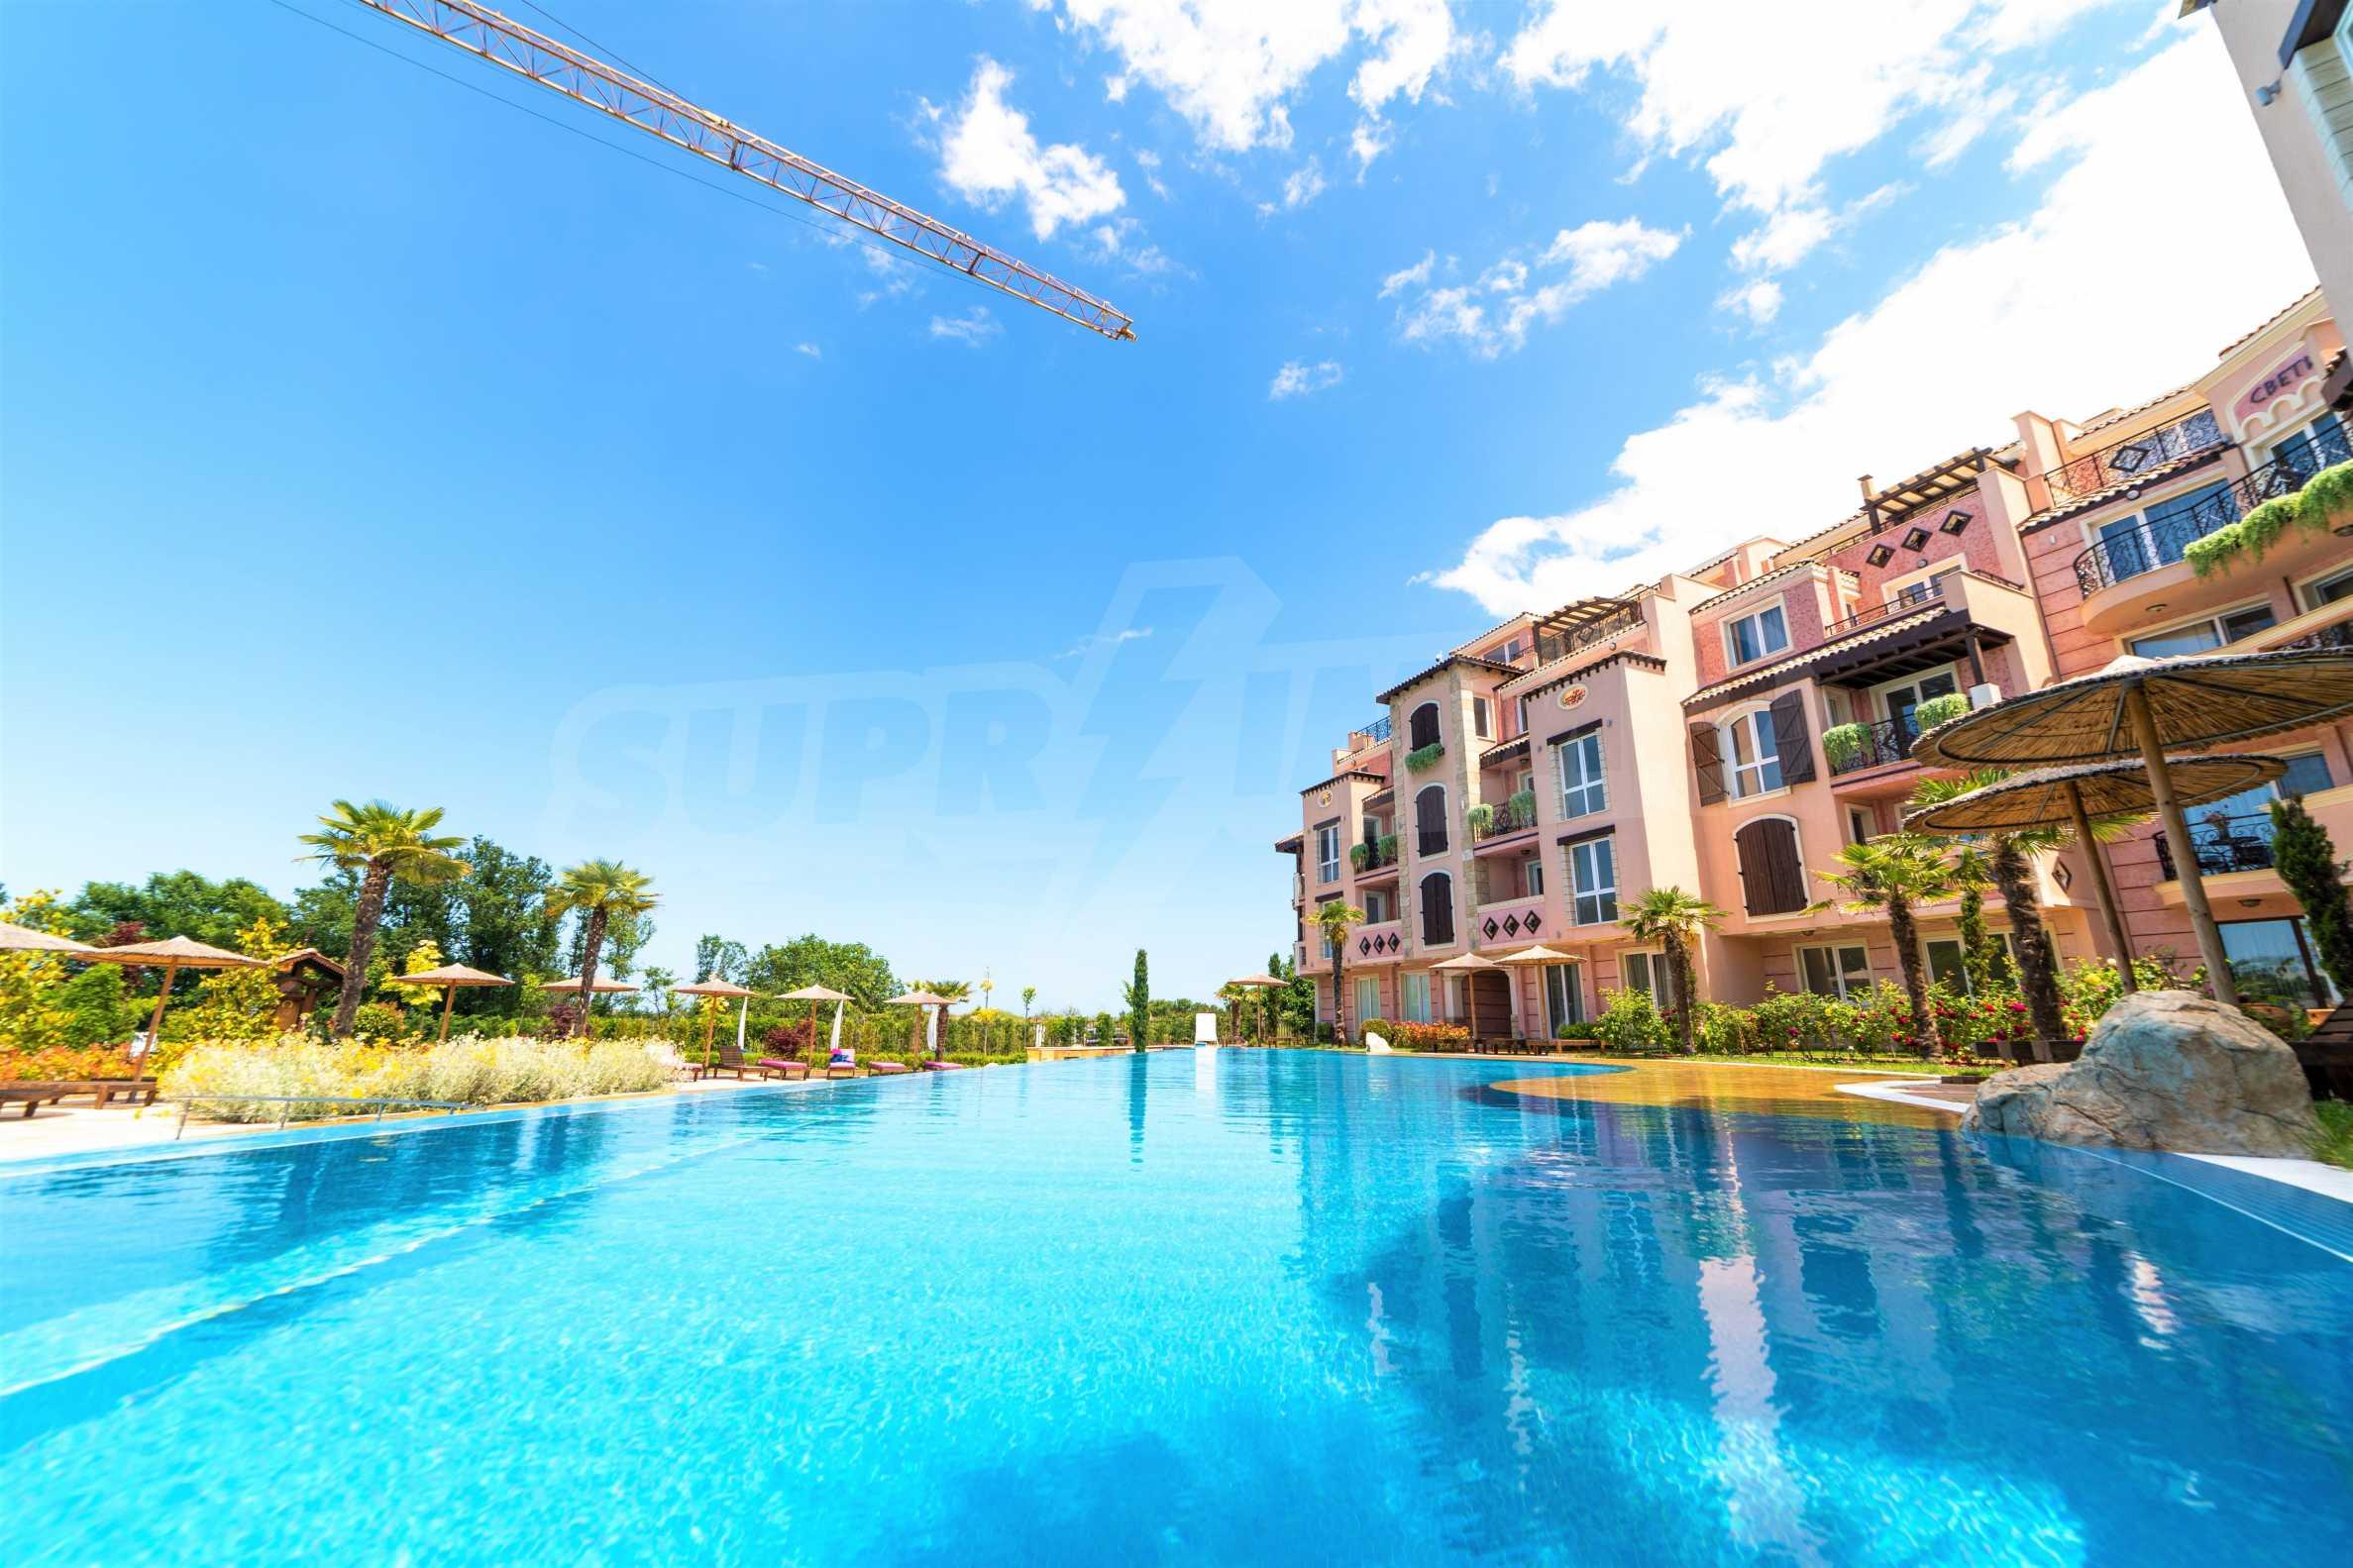 New 1-bedroom apartment in a coastal complex by the Kavatsite Beach (Sozopol) 1